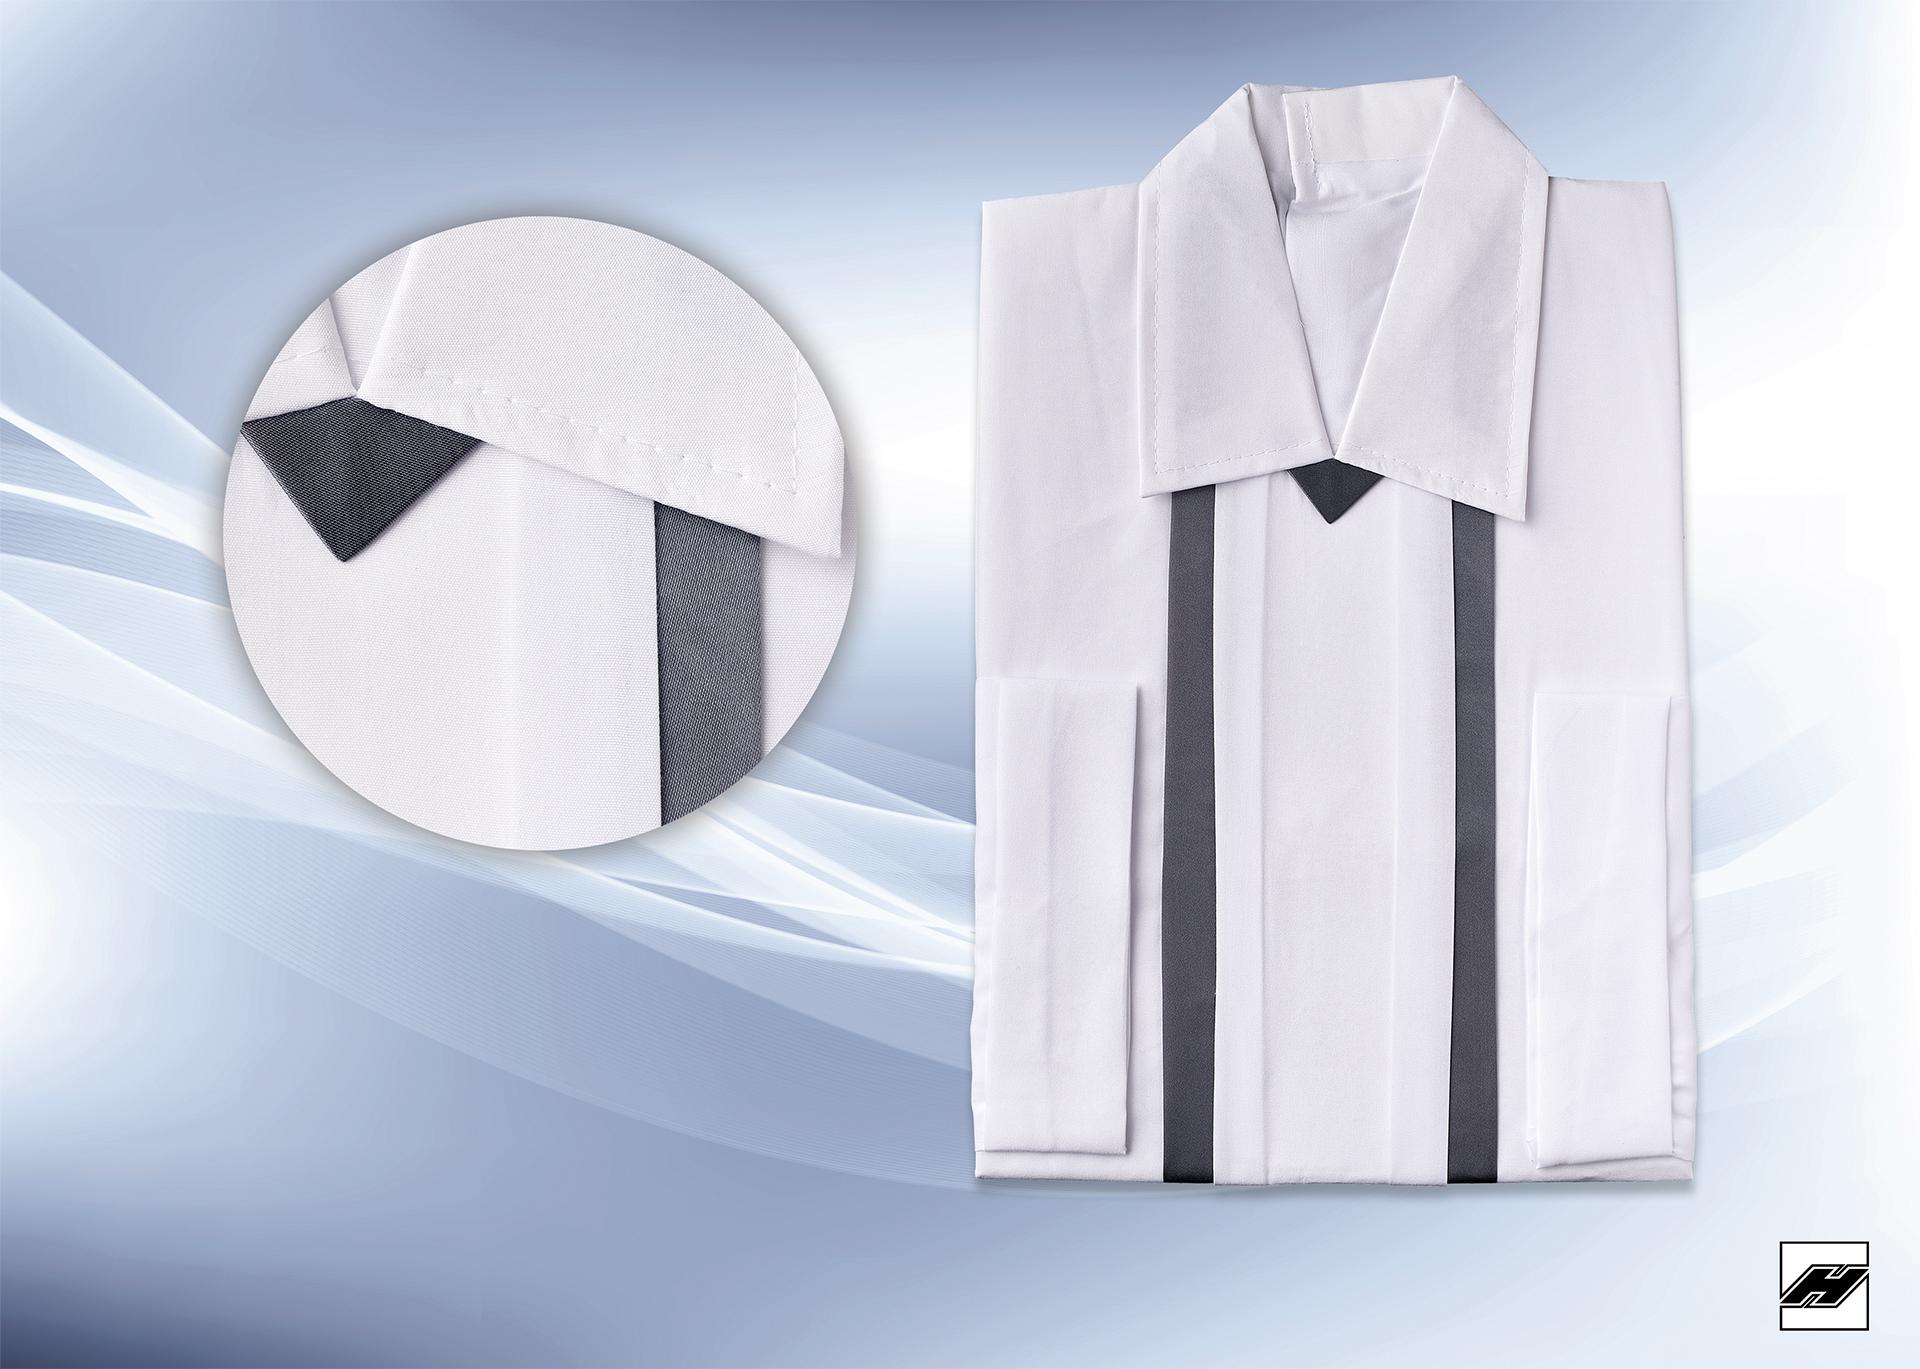 Herrenhemd 1556 Microquilt weiß, Borde anthrazit